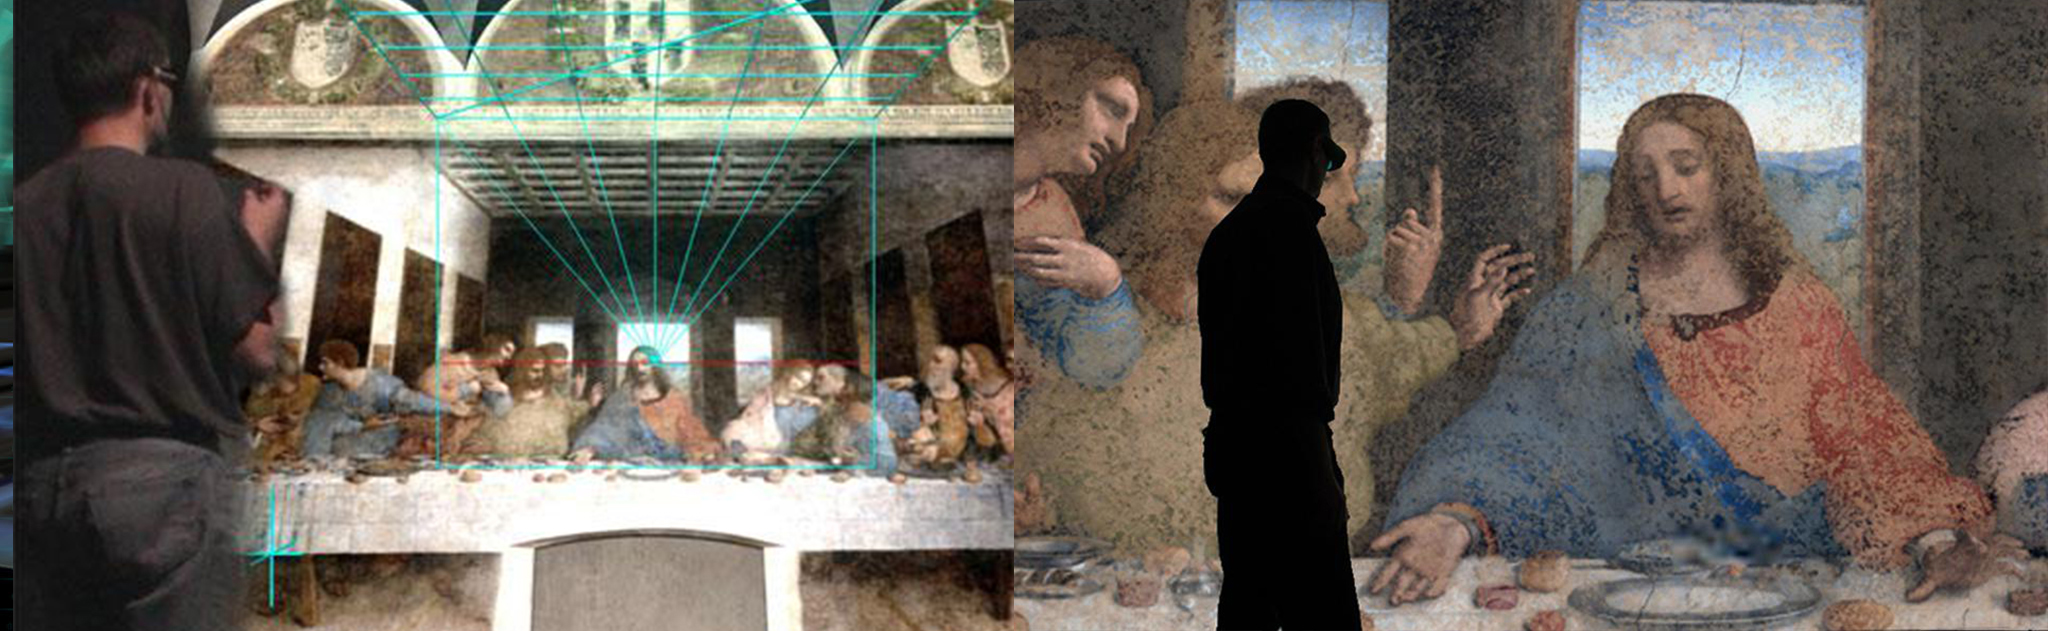 File last supper interactive 2012 vr application - Last supper 4k ...